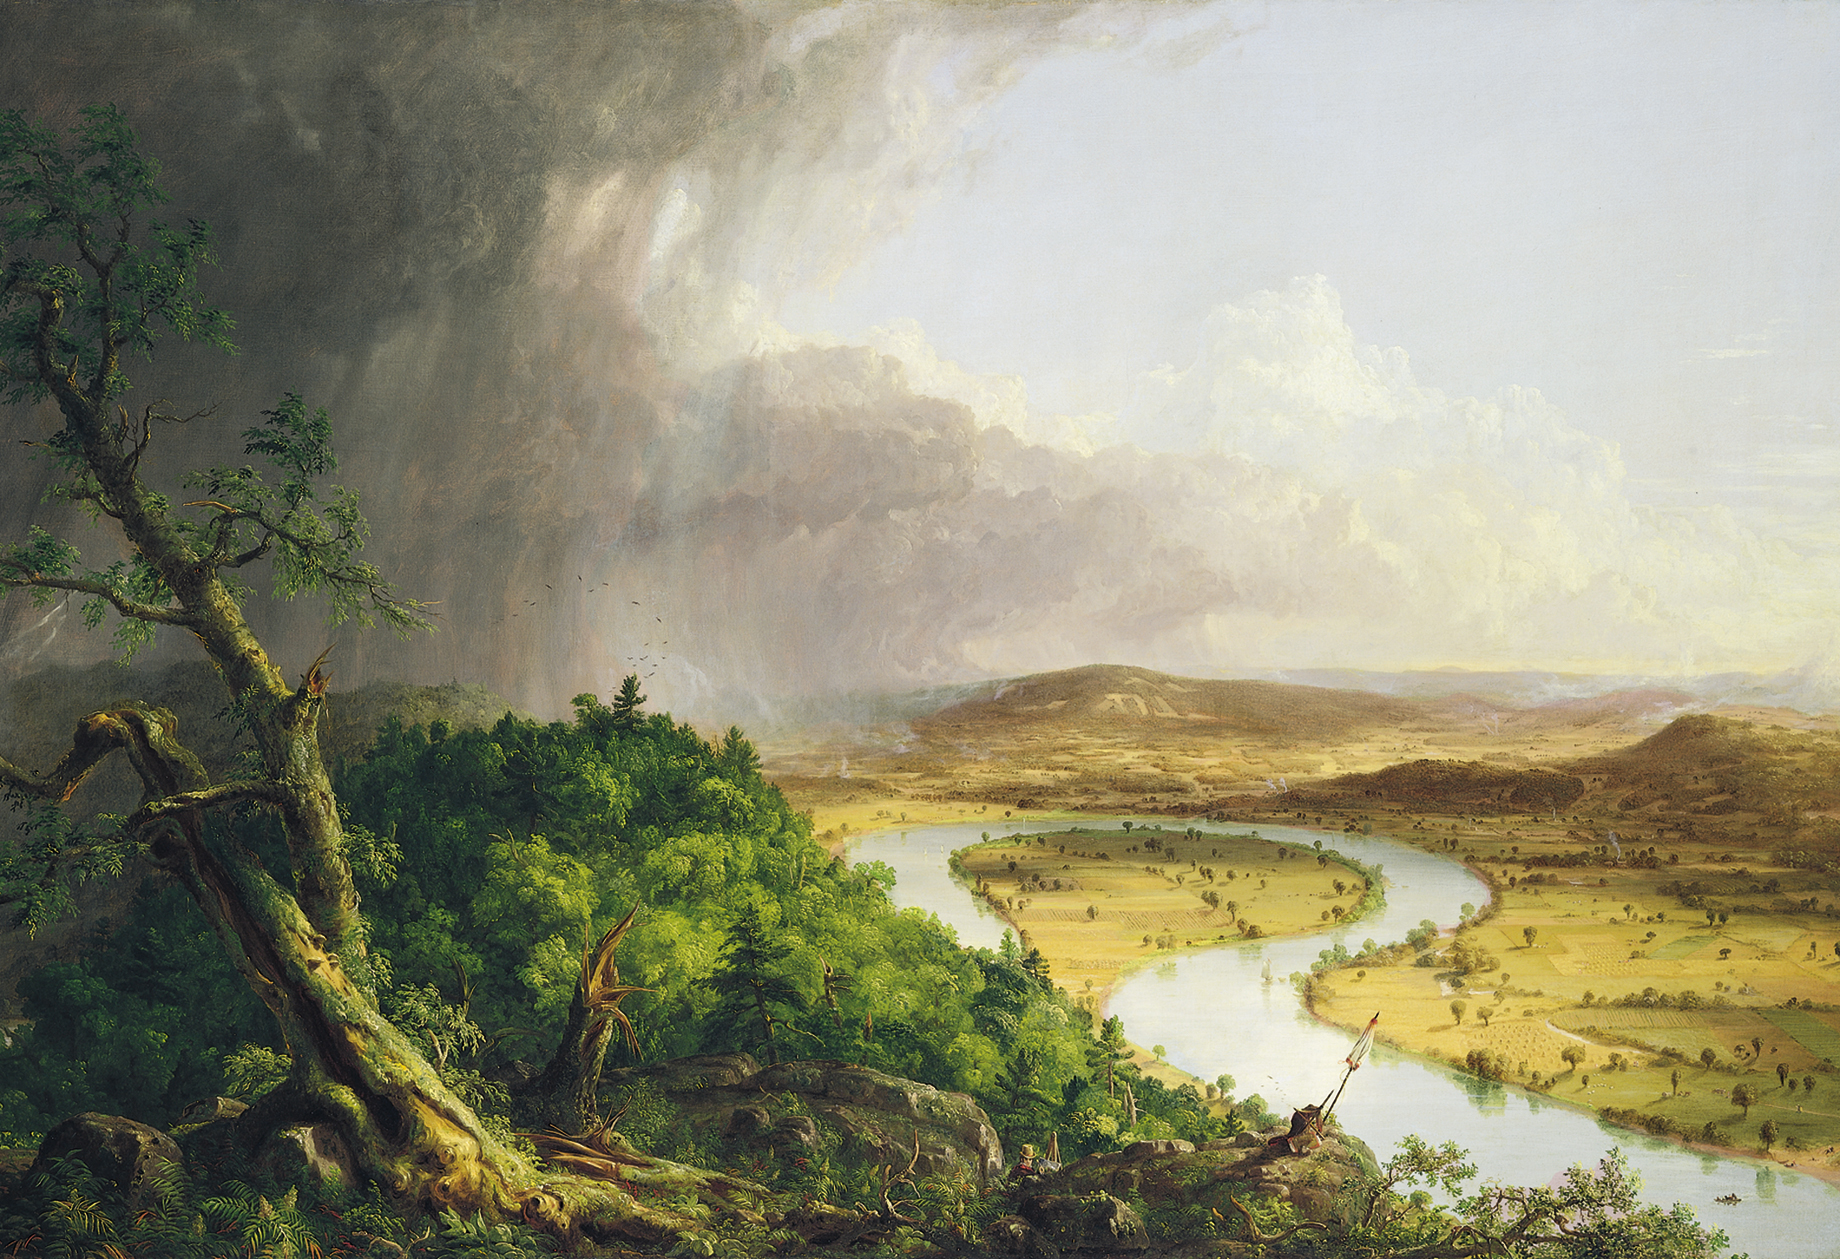 Хъдсън ривър – Уикипедия